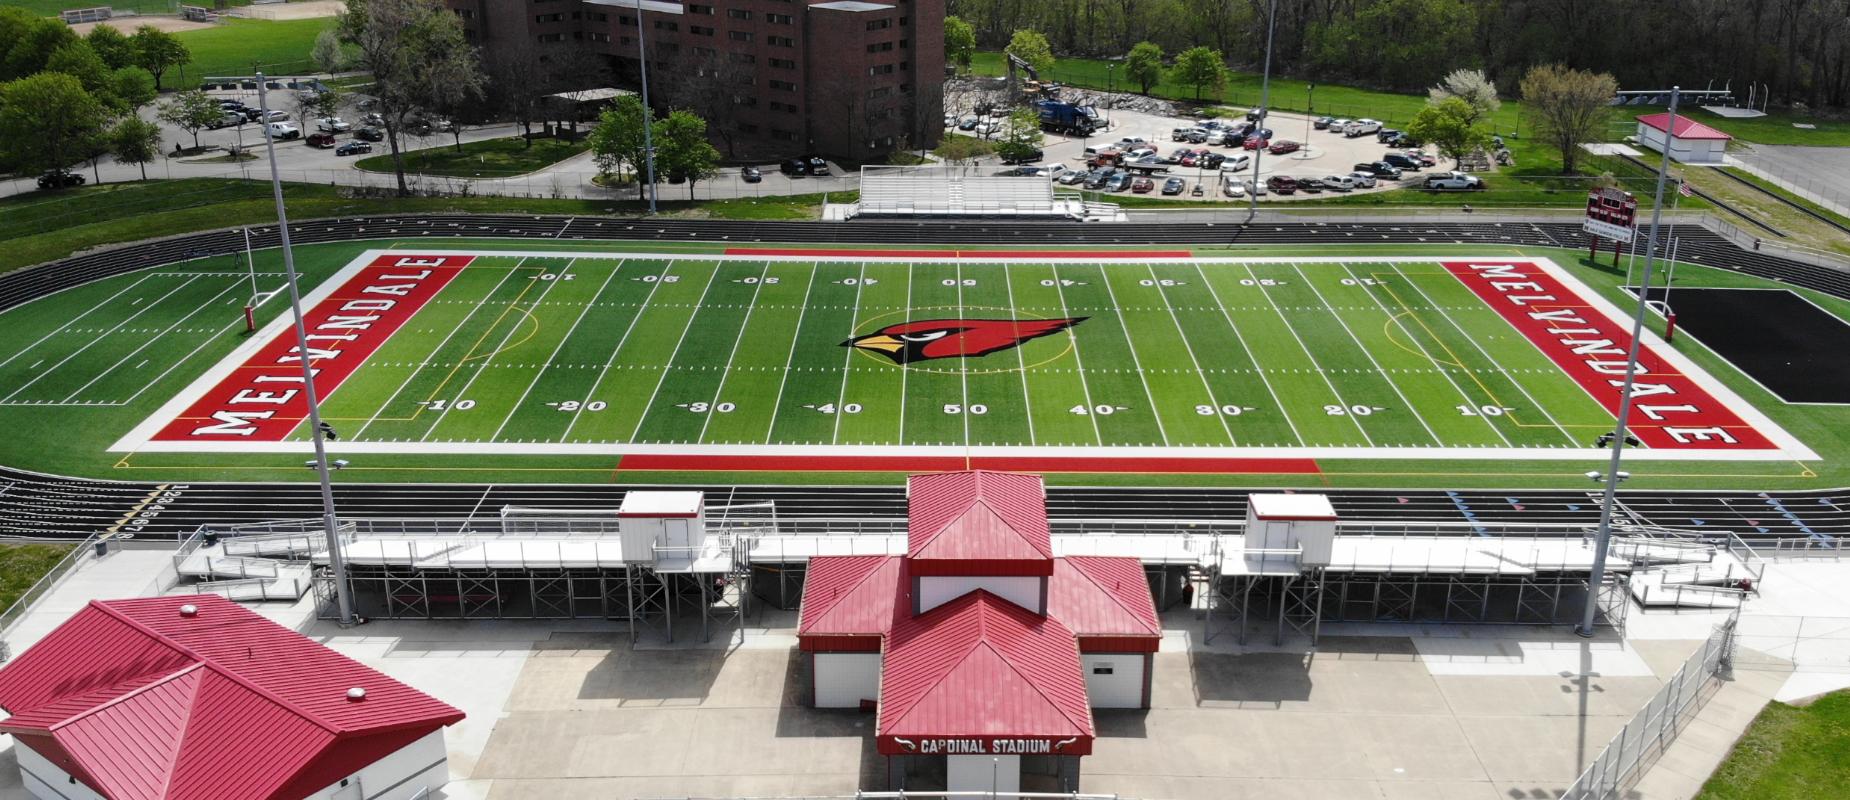 Ariel view of the athletics stadium football field.